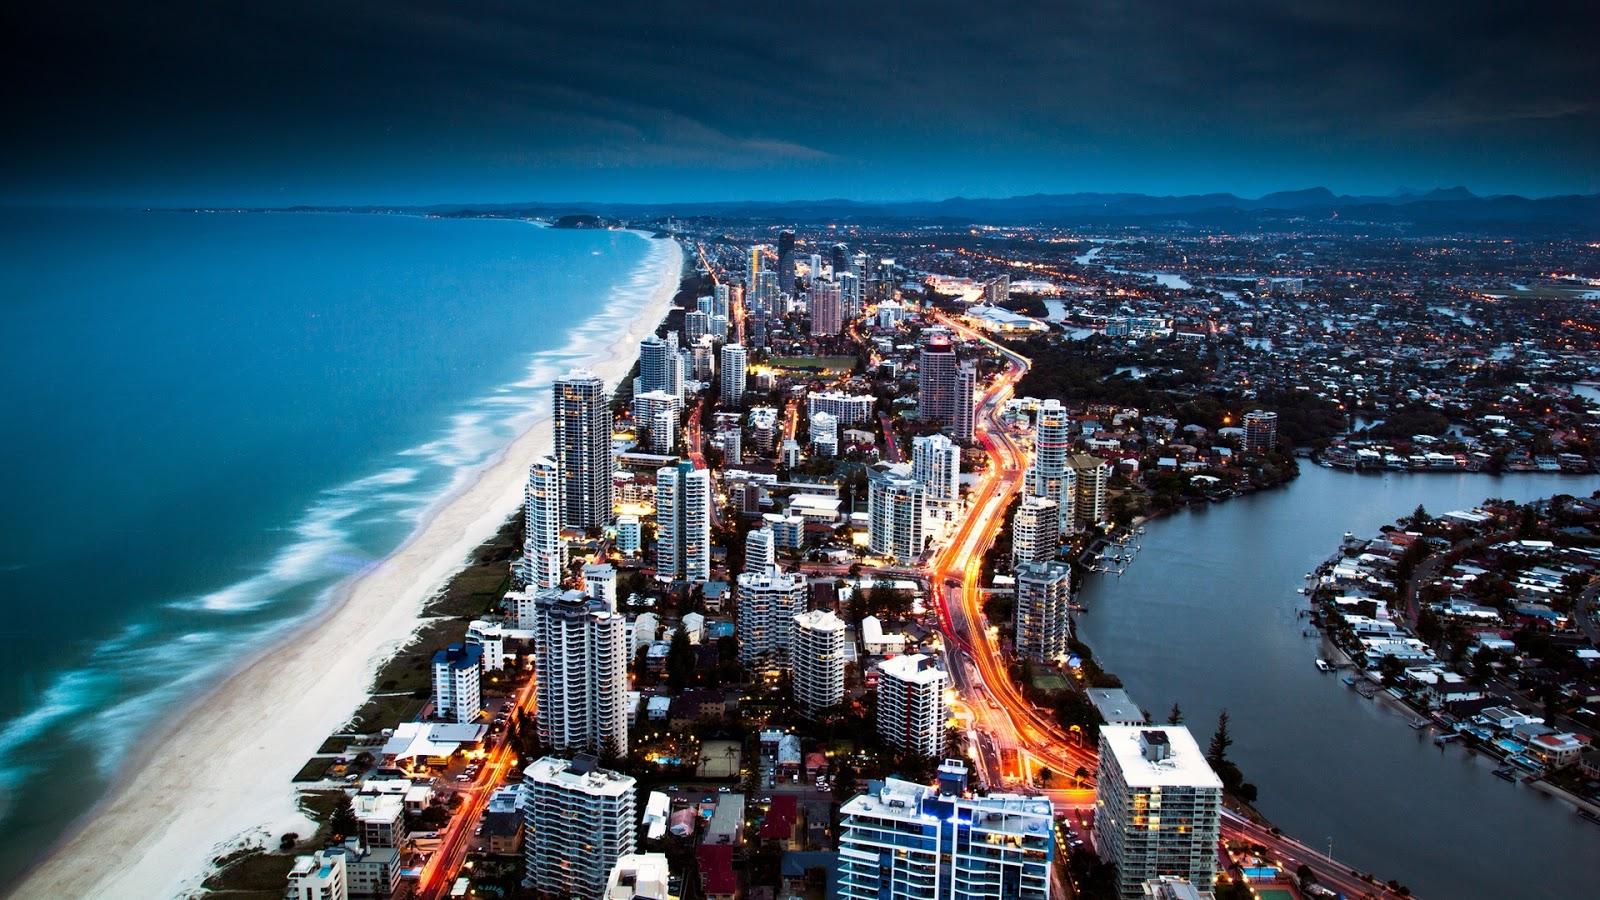 Beach Side City Wallpaper HD 1080p